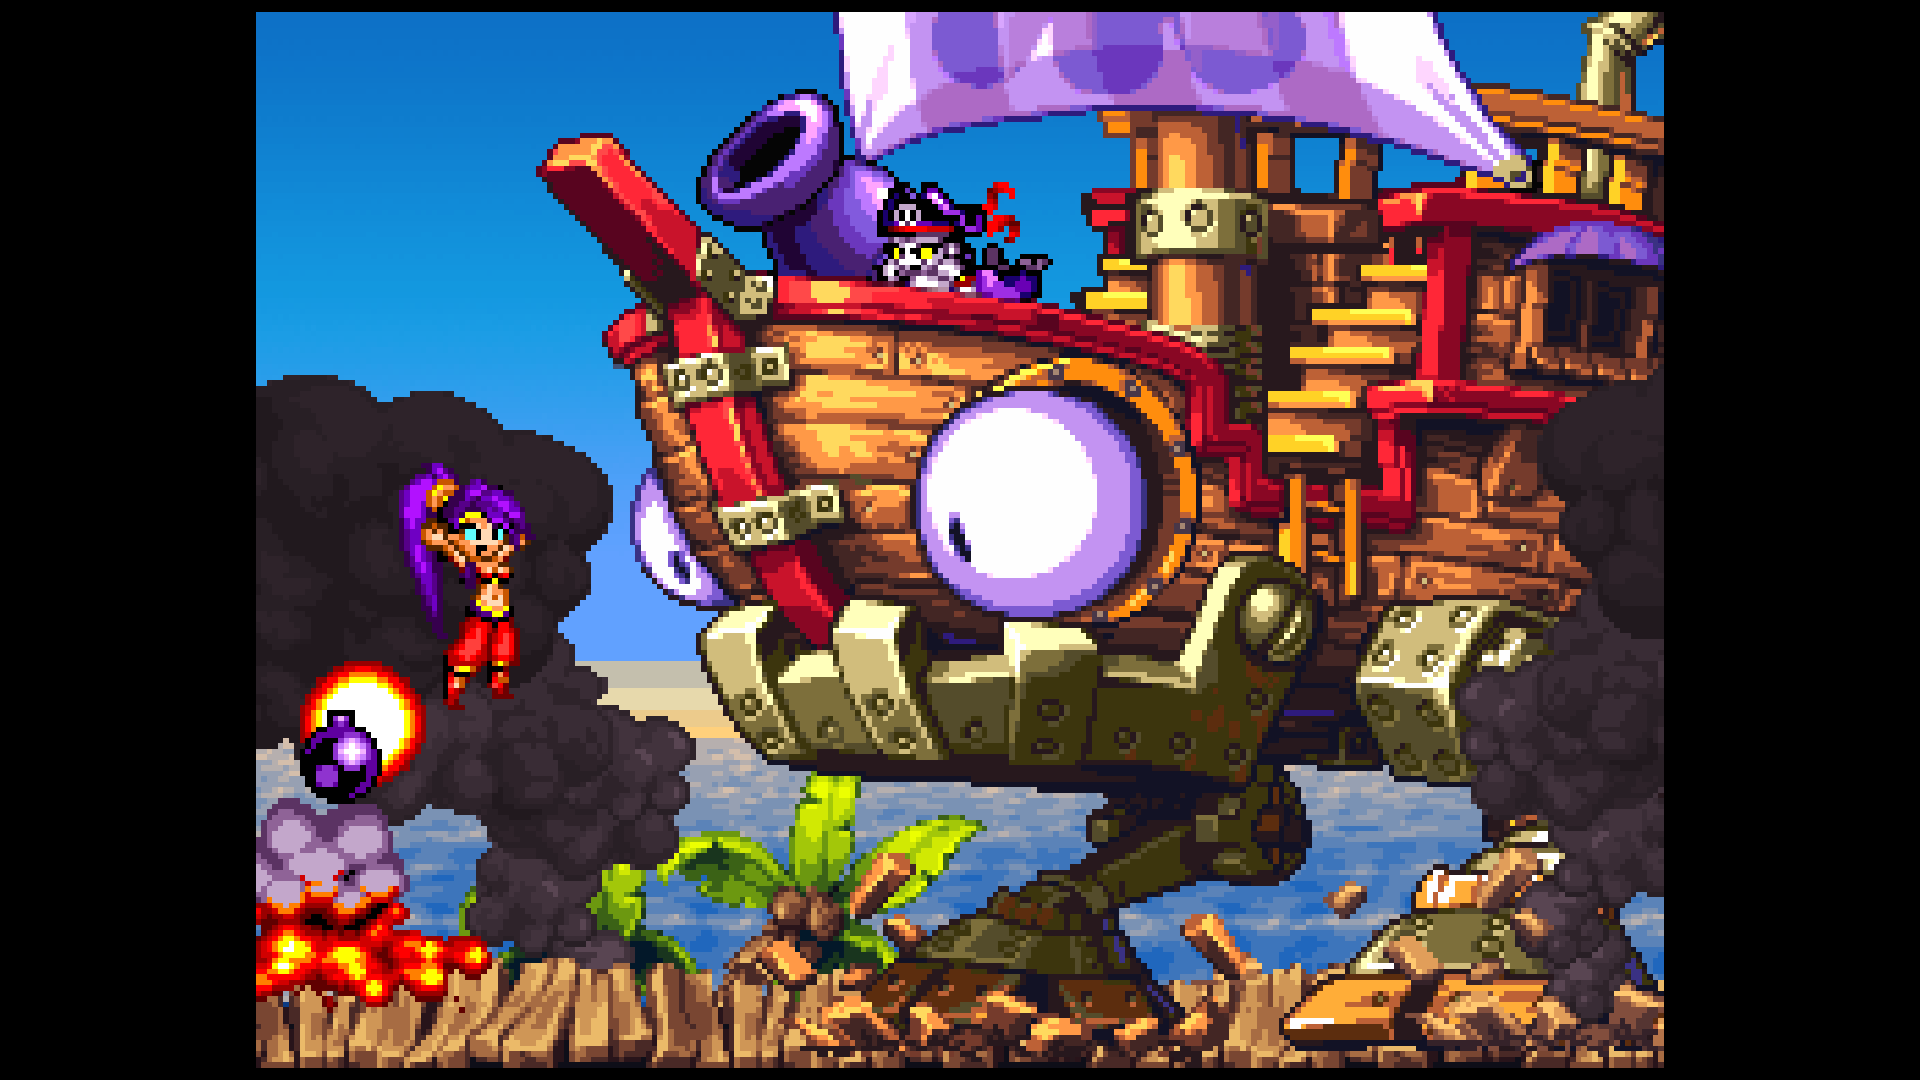 Shantae: Risky's Revenge Director's Cut